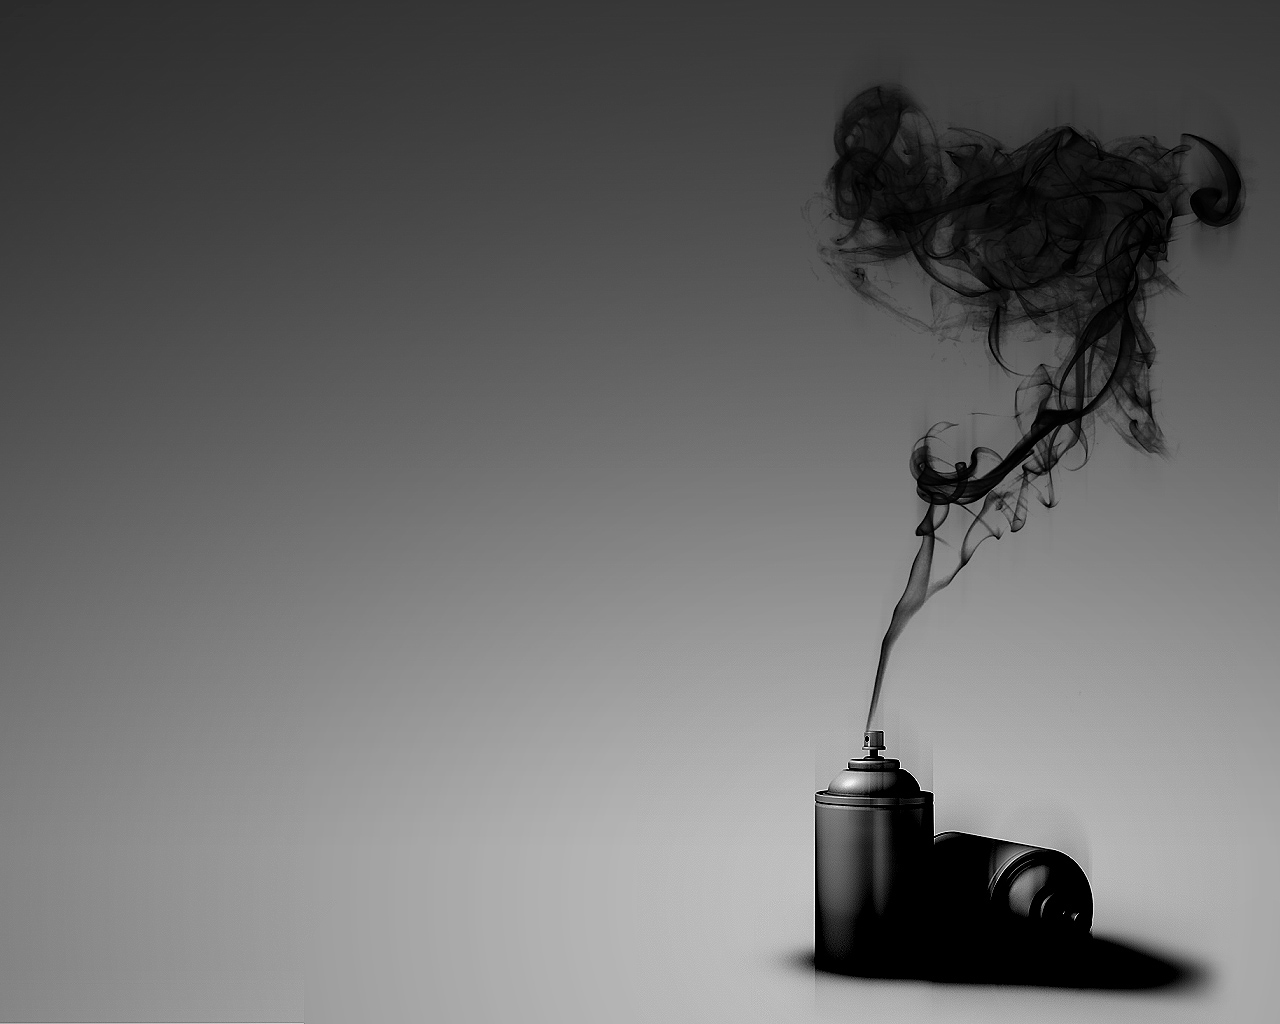 Black Smoke Wallpapers - Wallpaper Cave